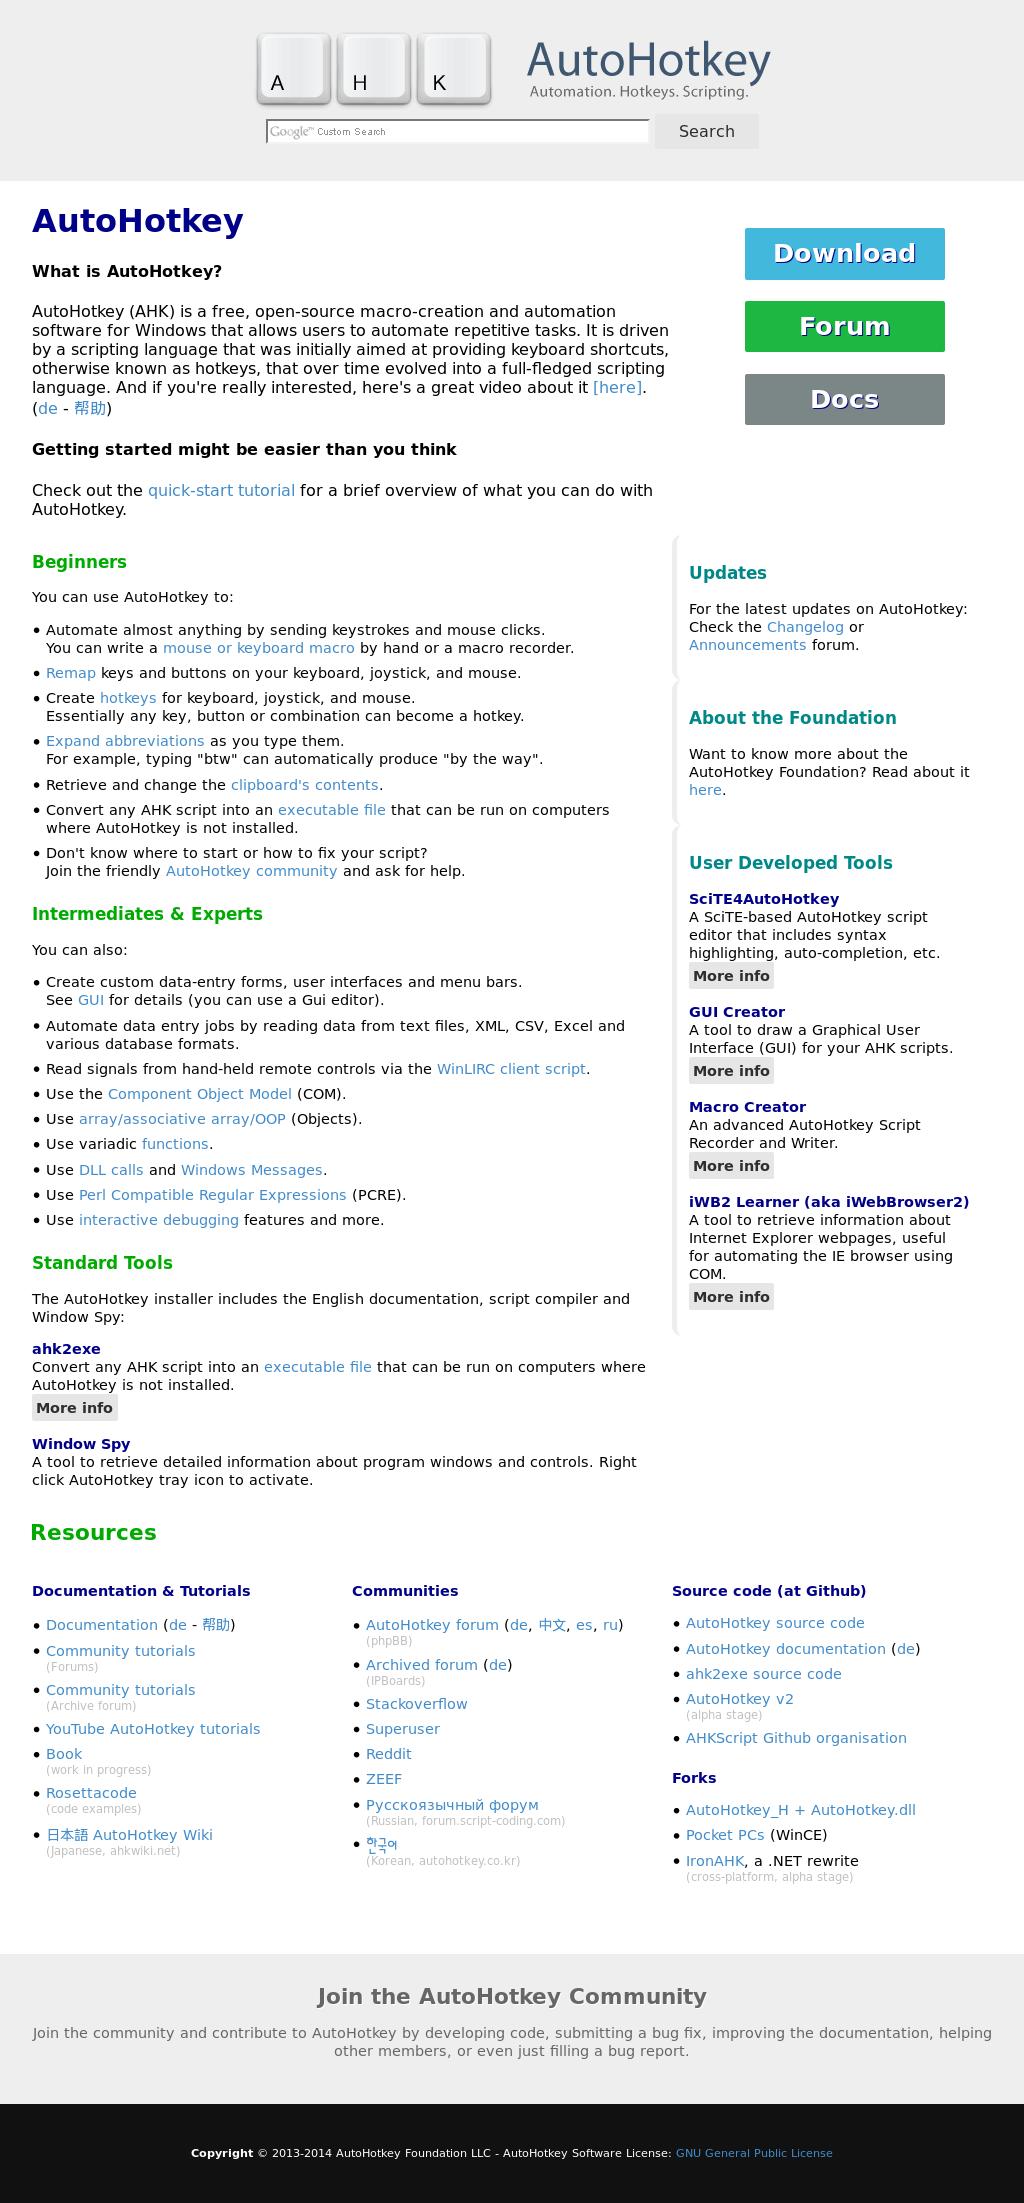 Autohotkey Competitors, Revenue and Employees - Owler